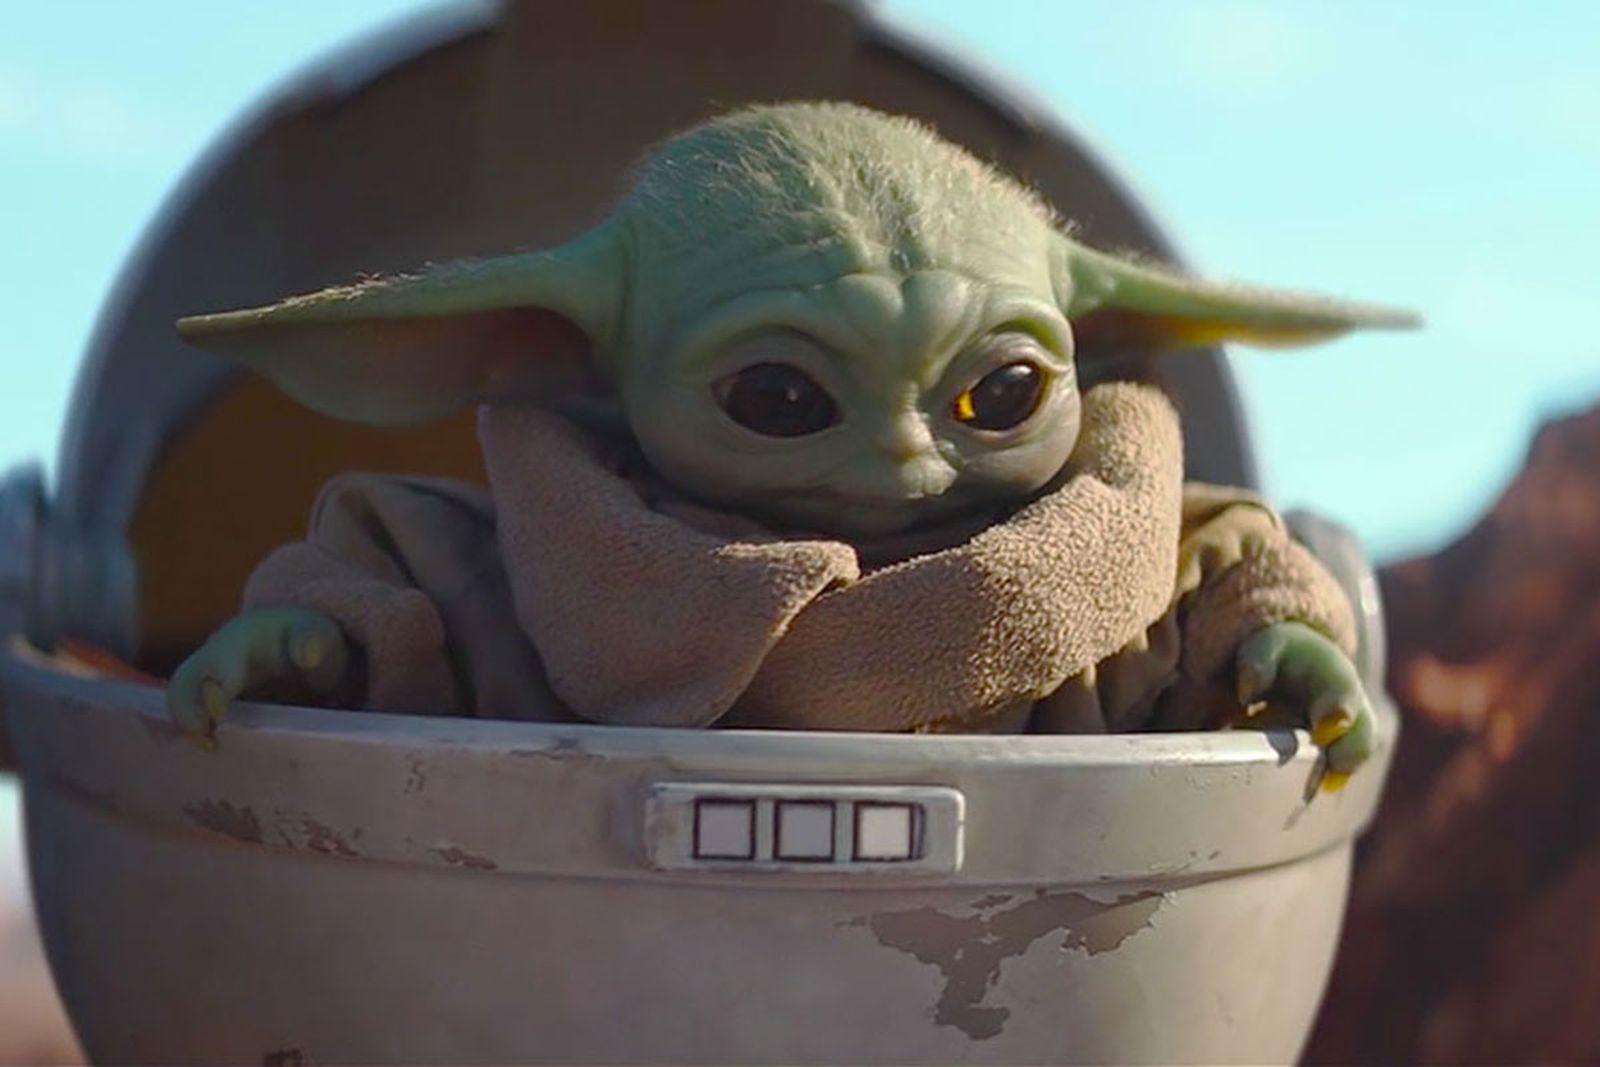 Baby Yoda in Disney+'s 'The Mandalorian'